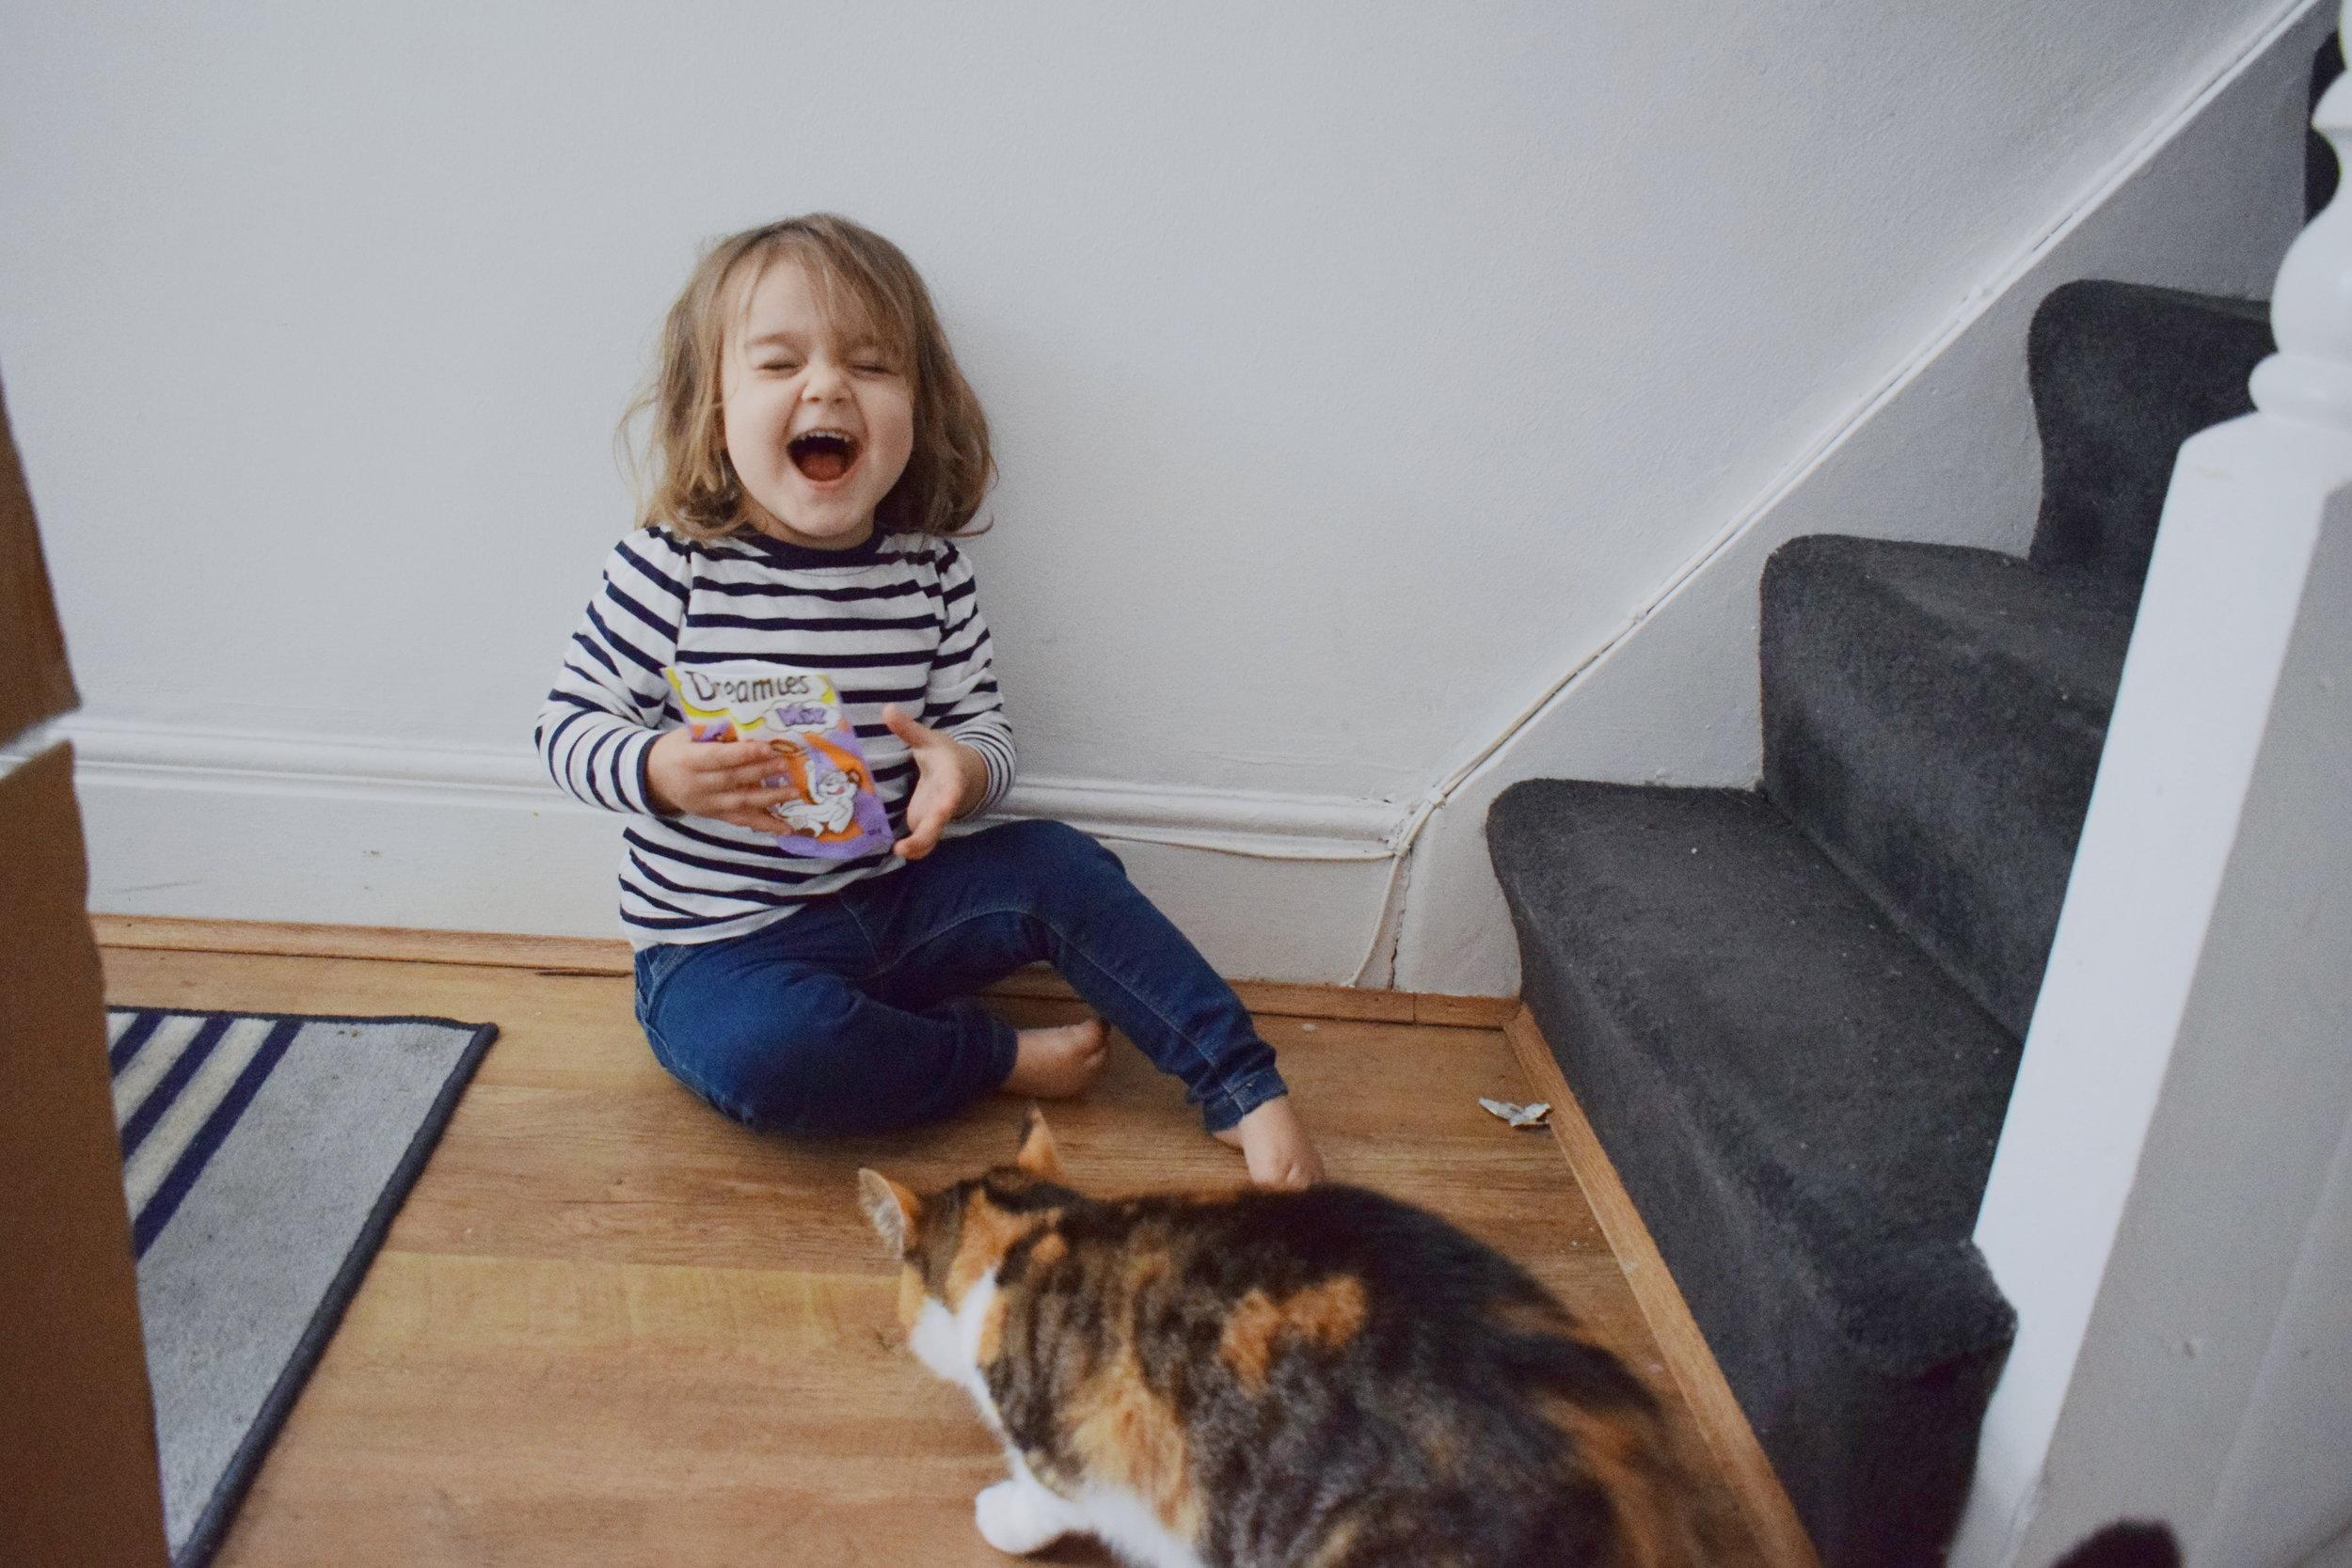 Feeding our pet cat Dreamies